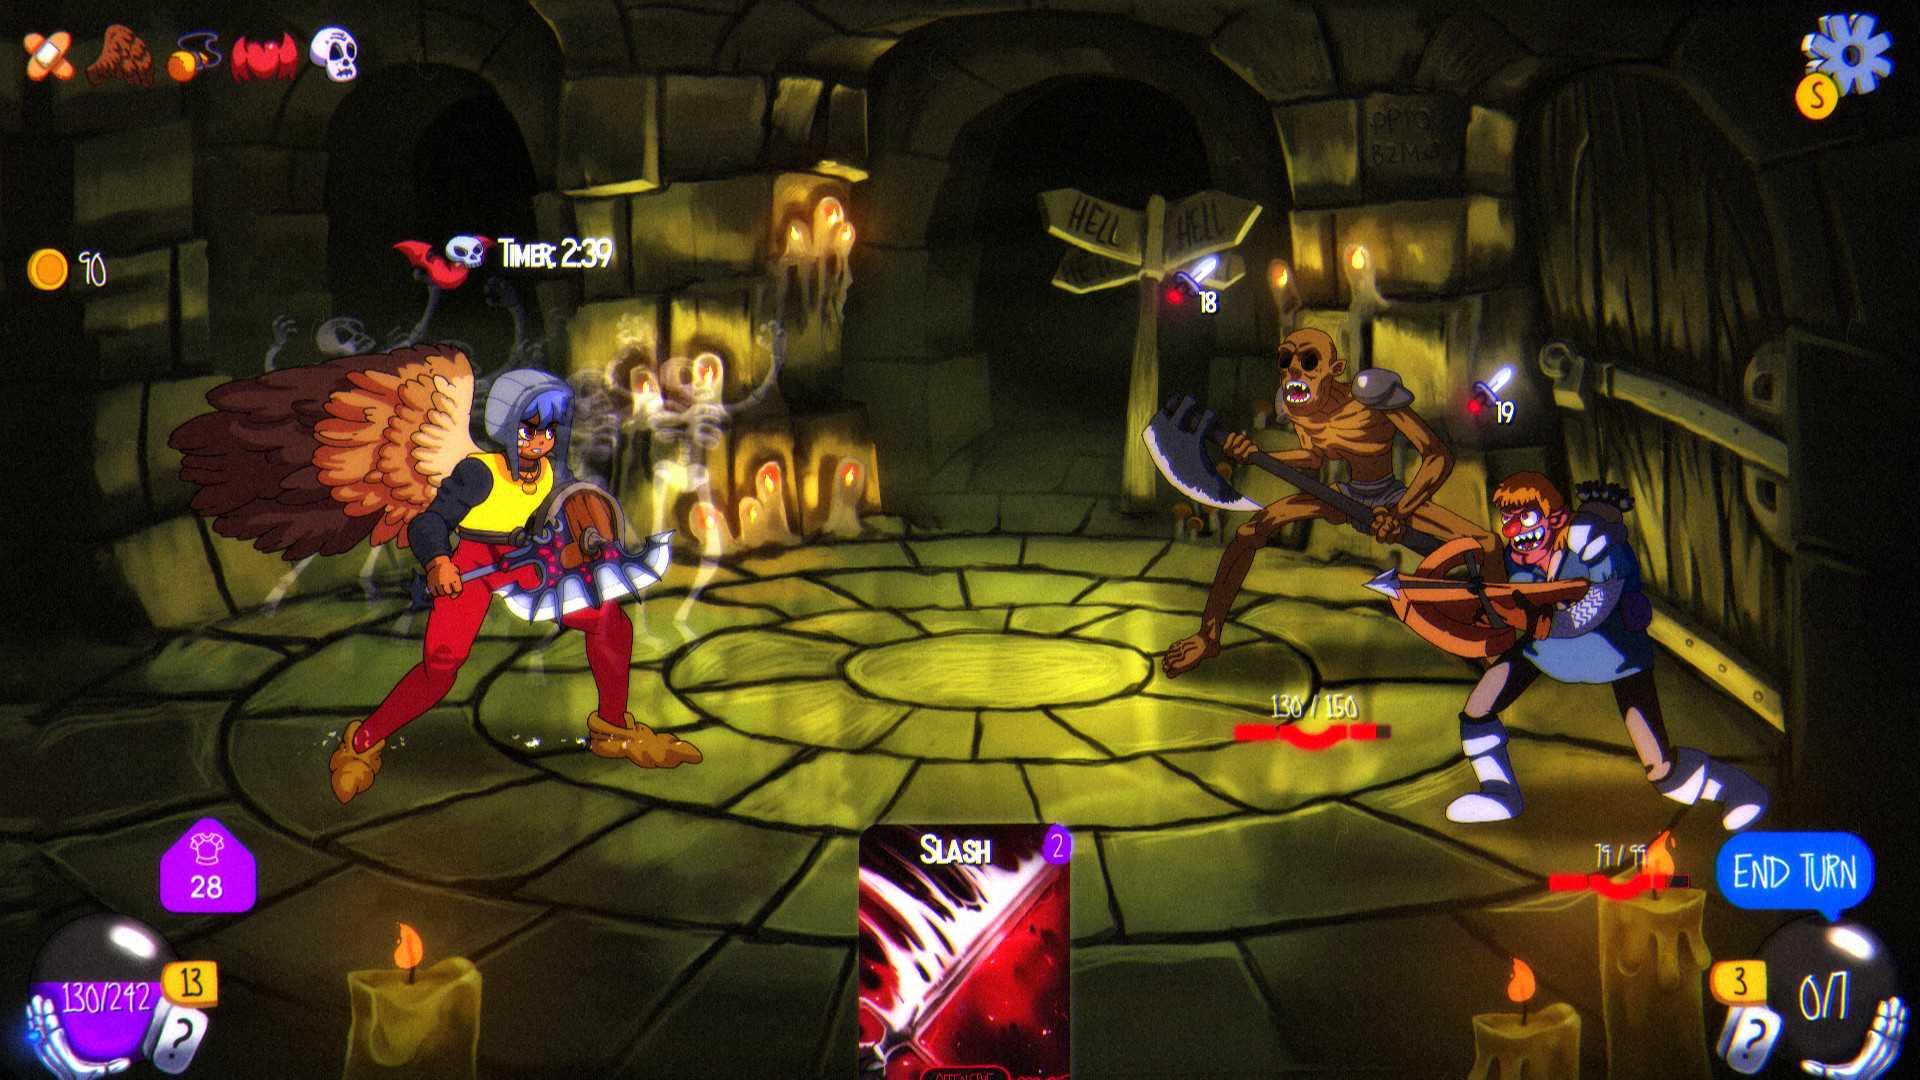 Card Battler Special Teil 2 Doors of Insanity Screenshot